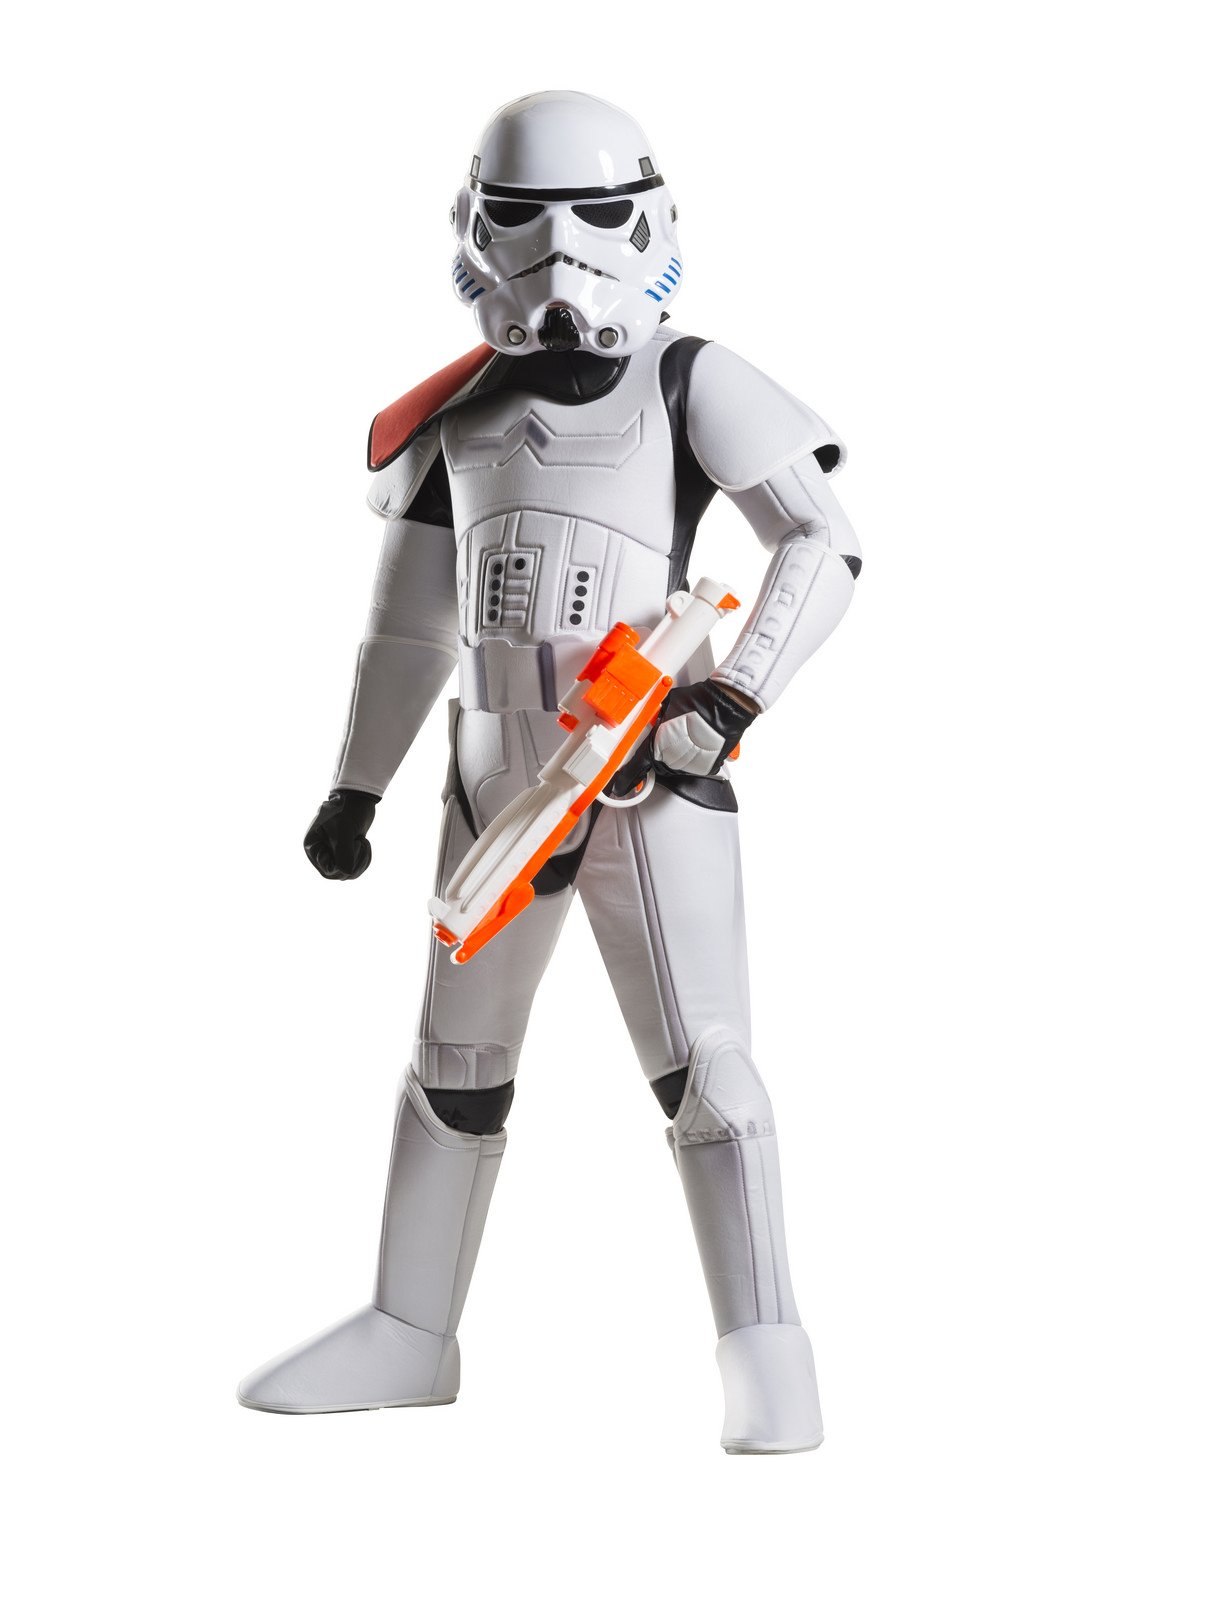 Rubie's Costume Co Stormtrooper Child Costume - Small